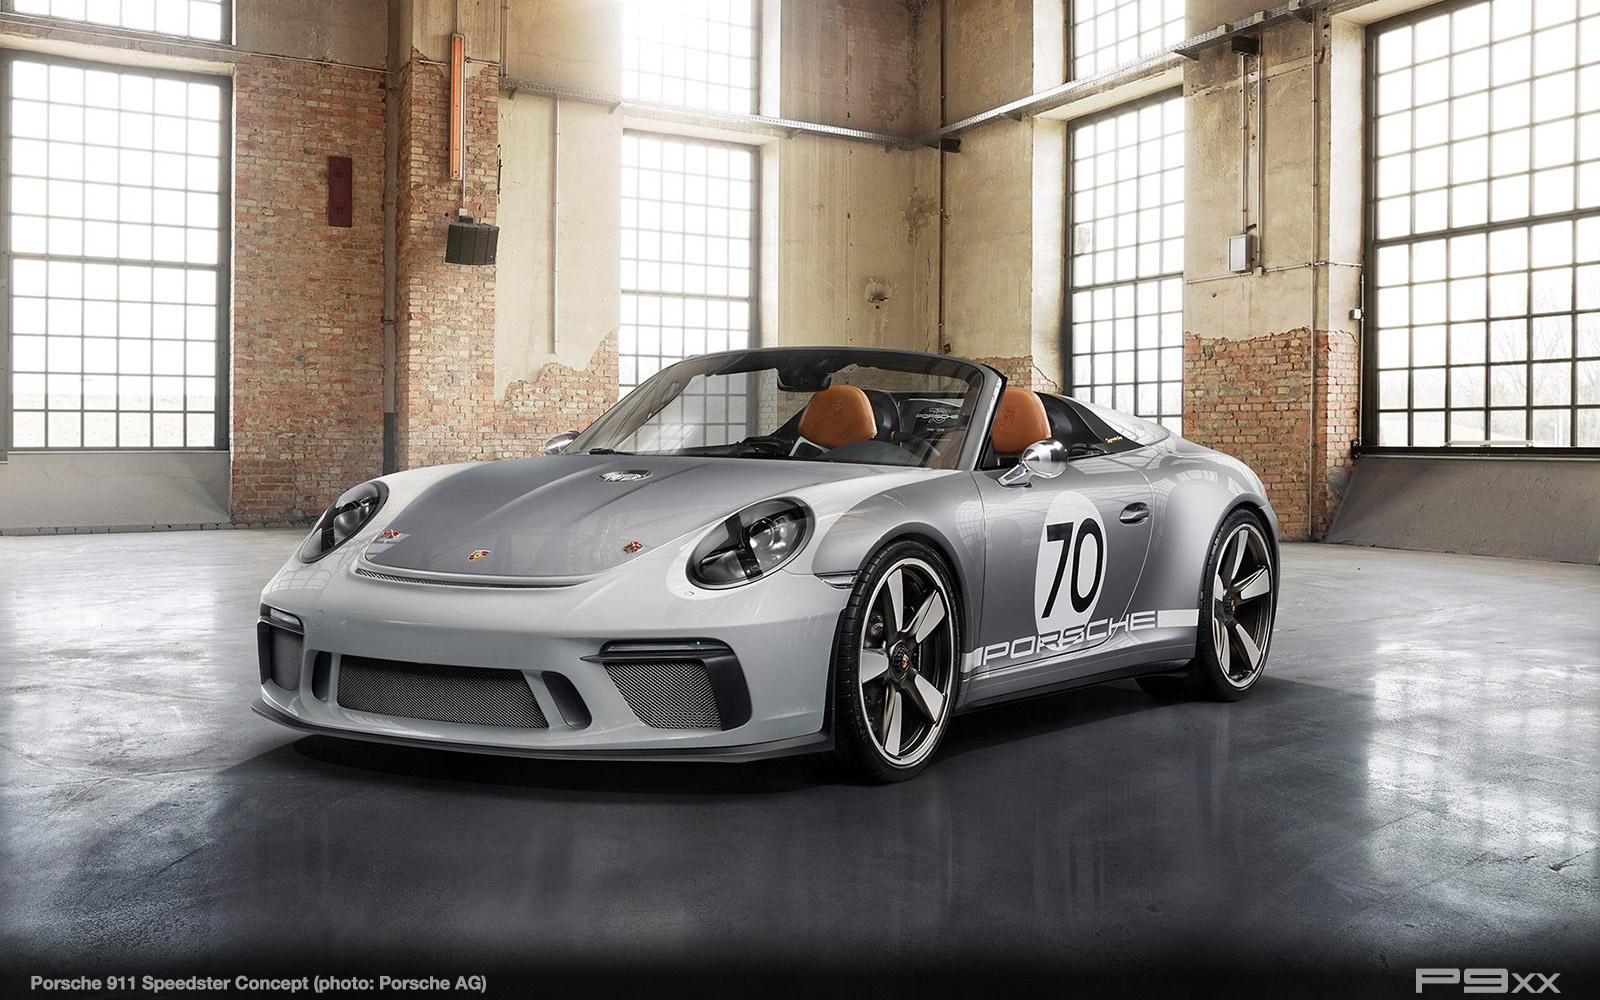 Porsche-911-Speedster-Concept-2018-298